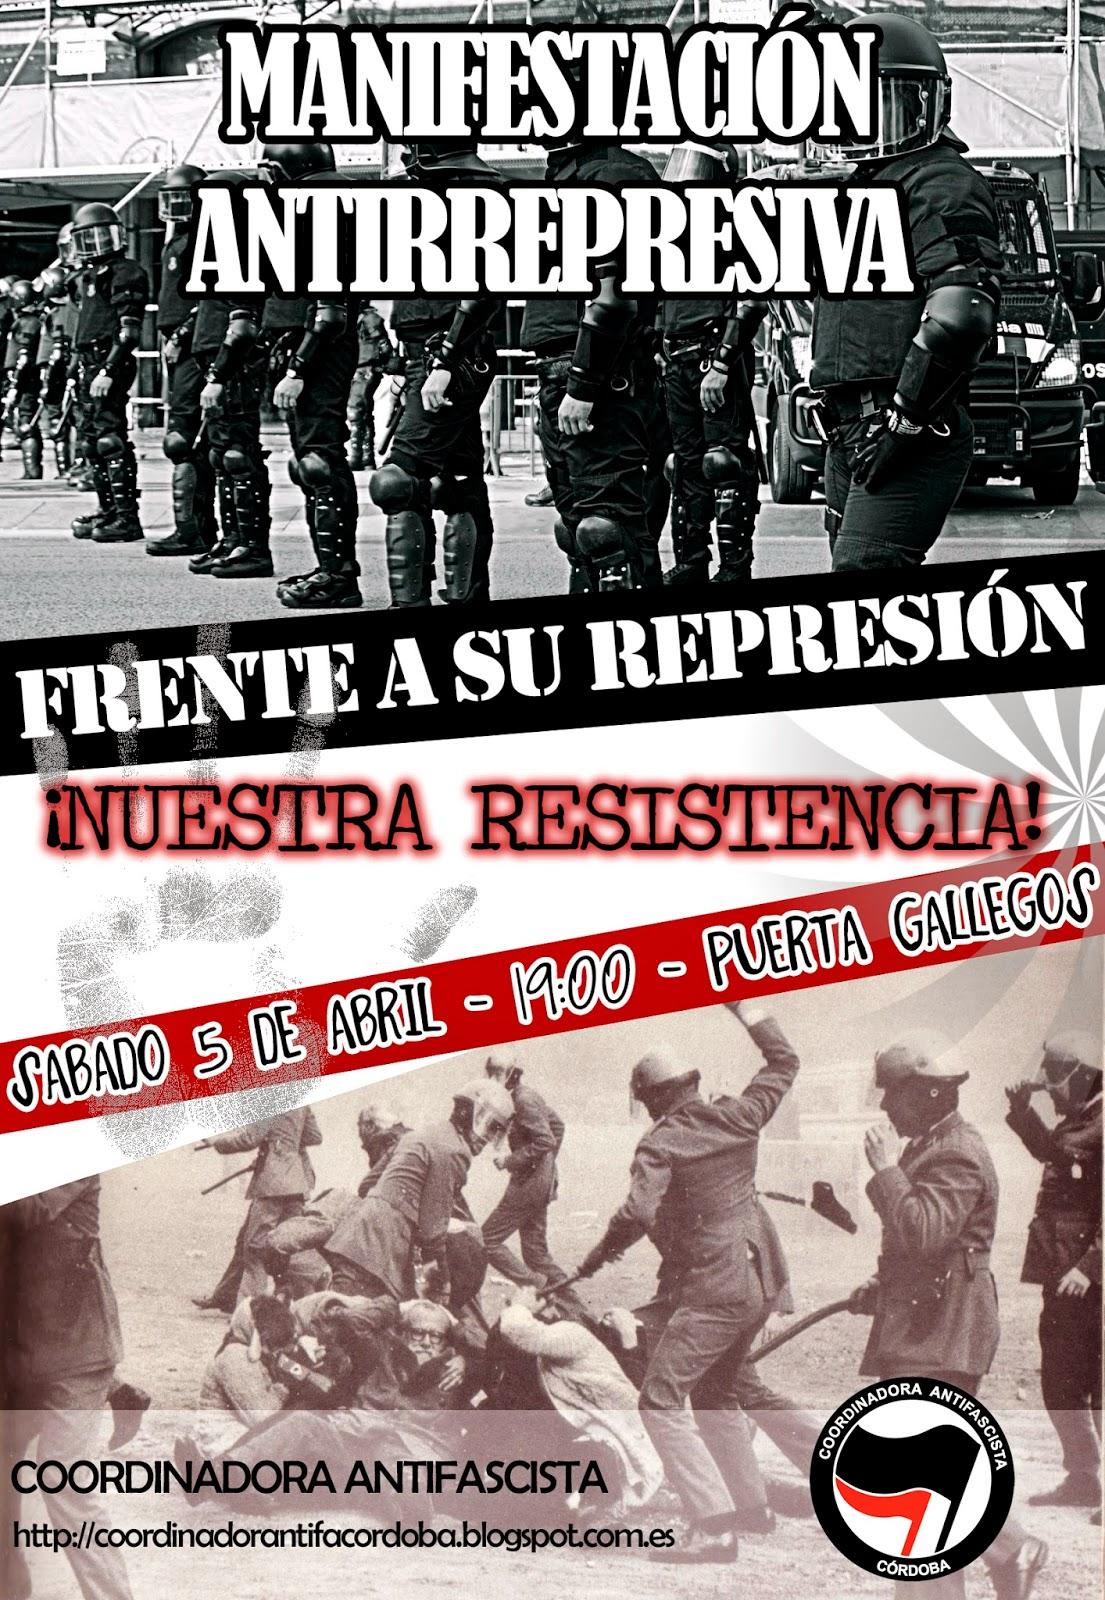 http://coordinadorantifacordoba.blogspot.com.es/2014/04/manifestacion-antirrepresiva-5-de-abril.html